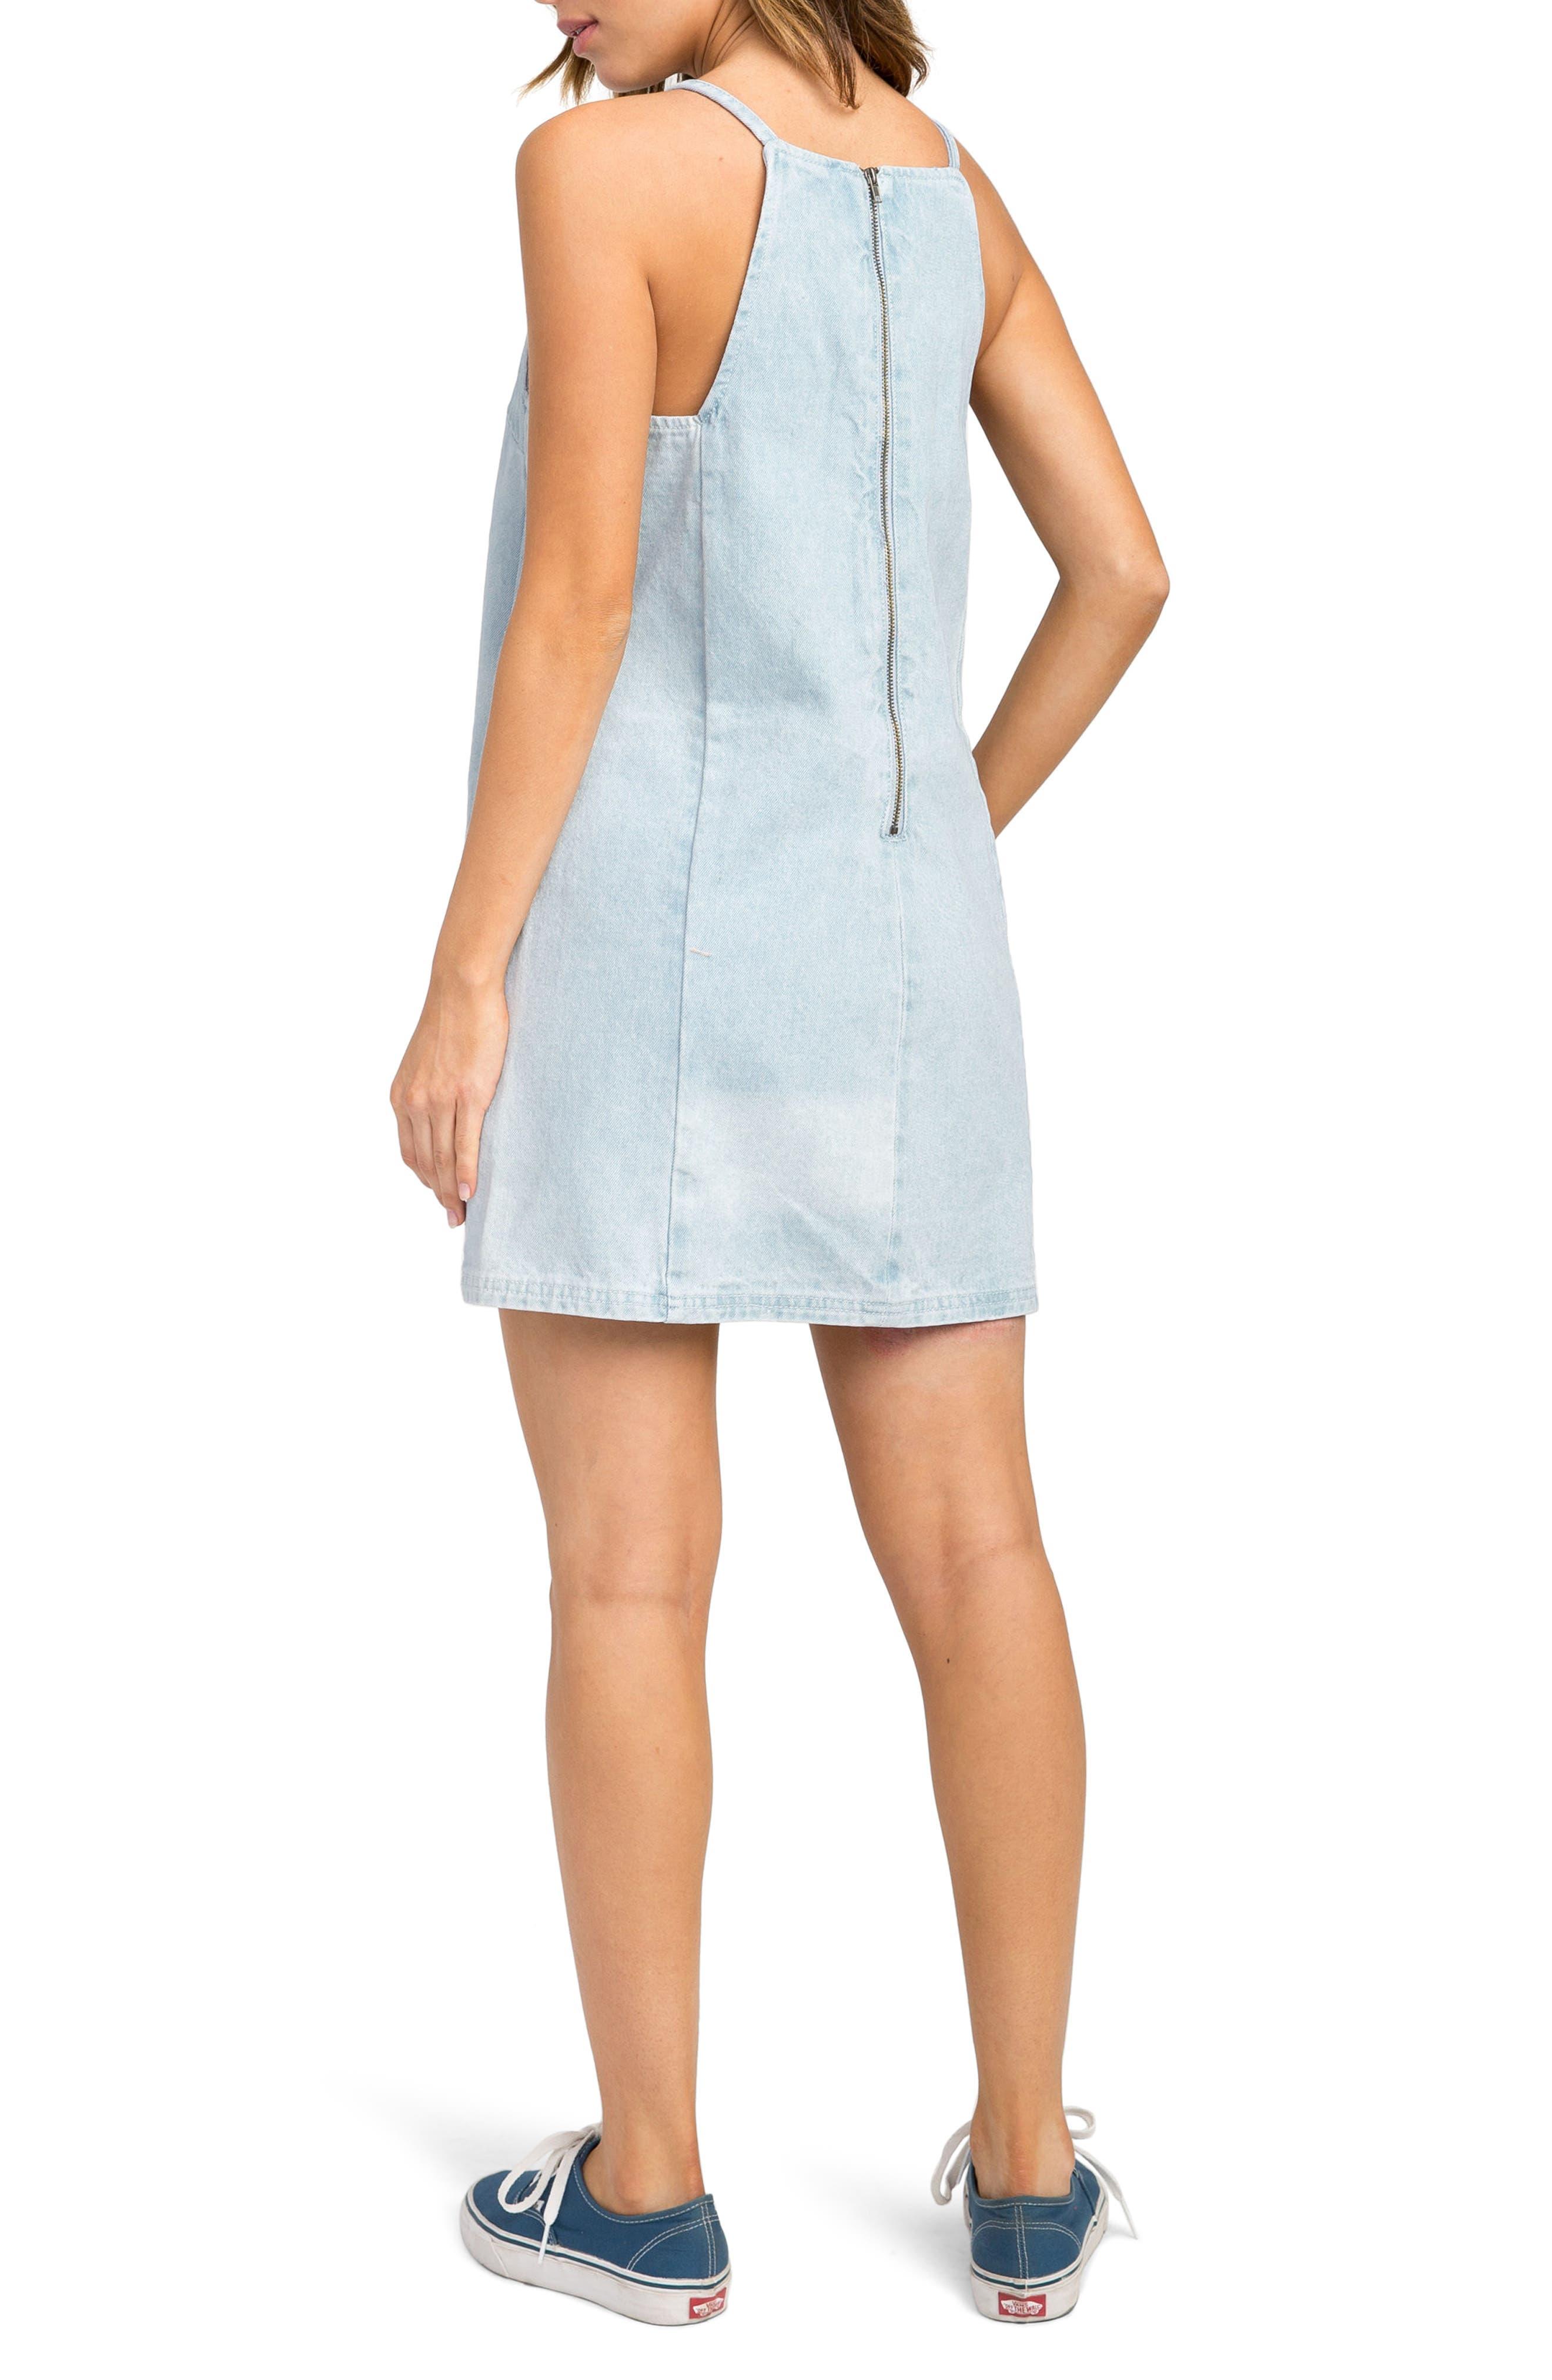 Maple Denim Apron Dress,                             Alternate thumbnail 2, color,                             401